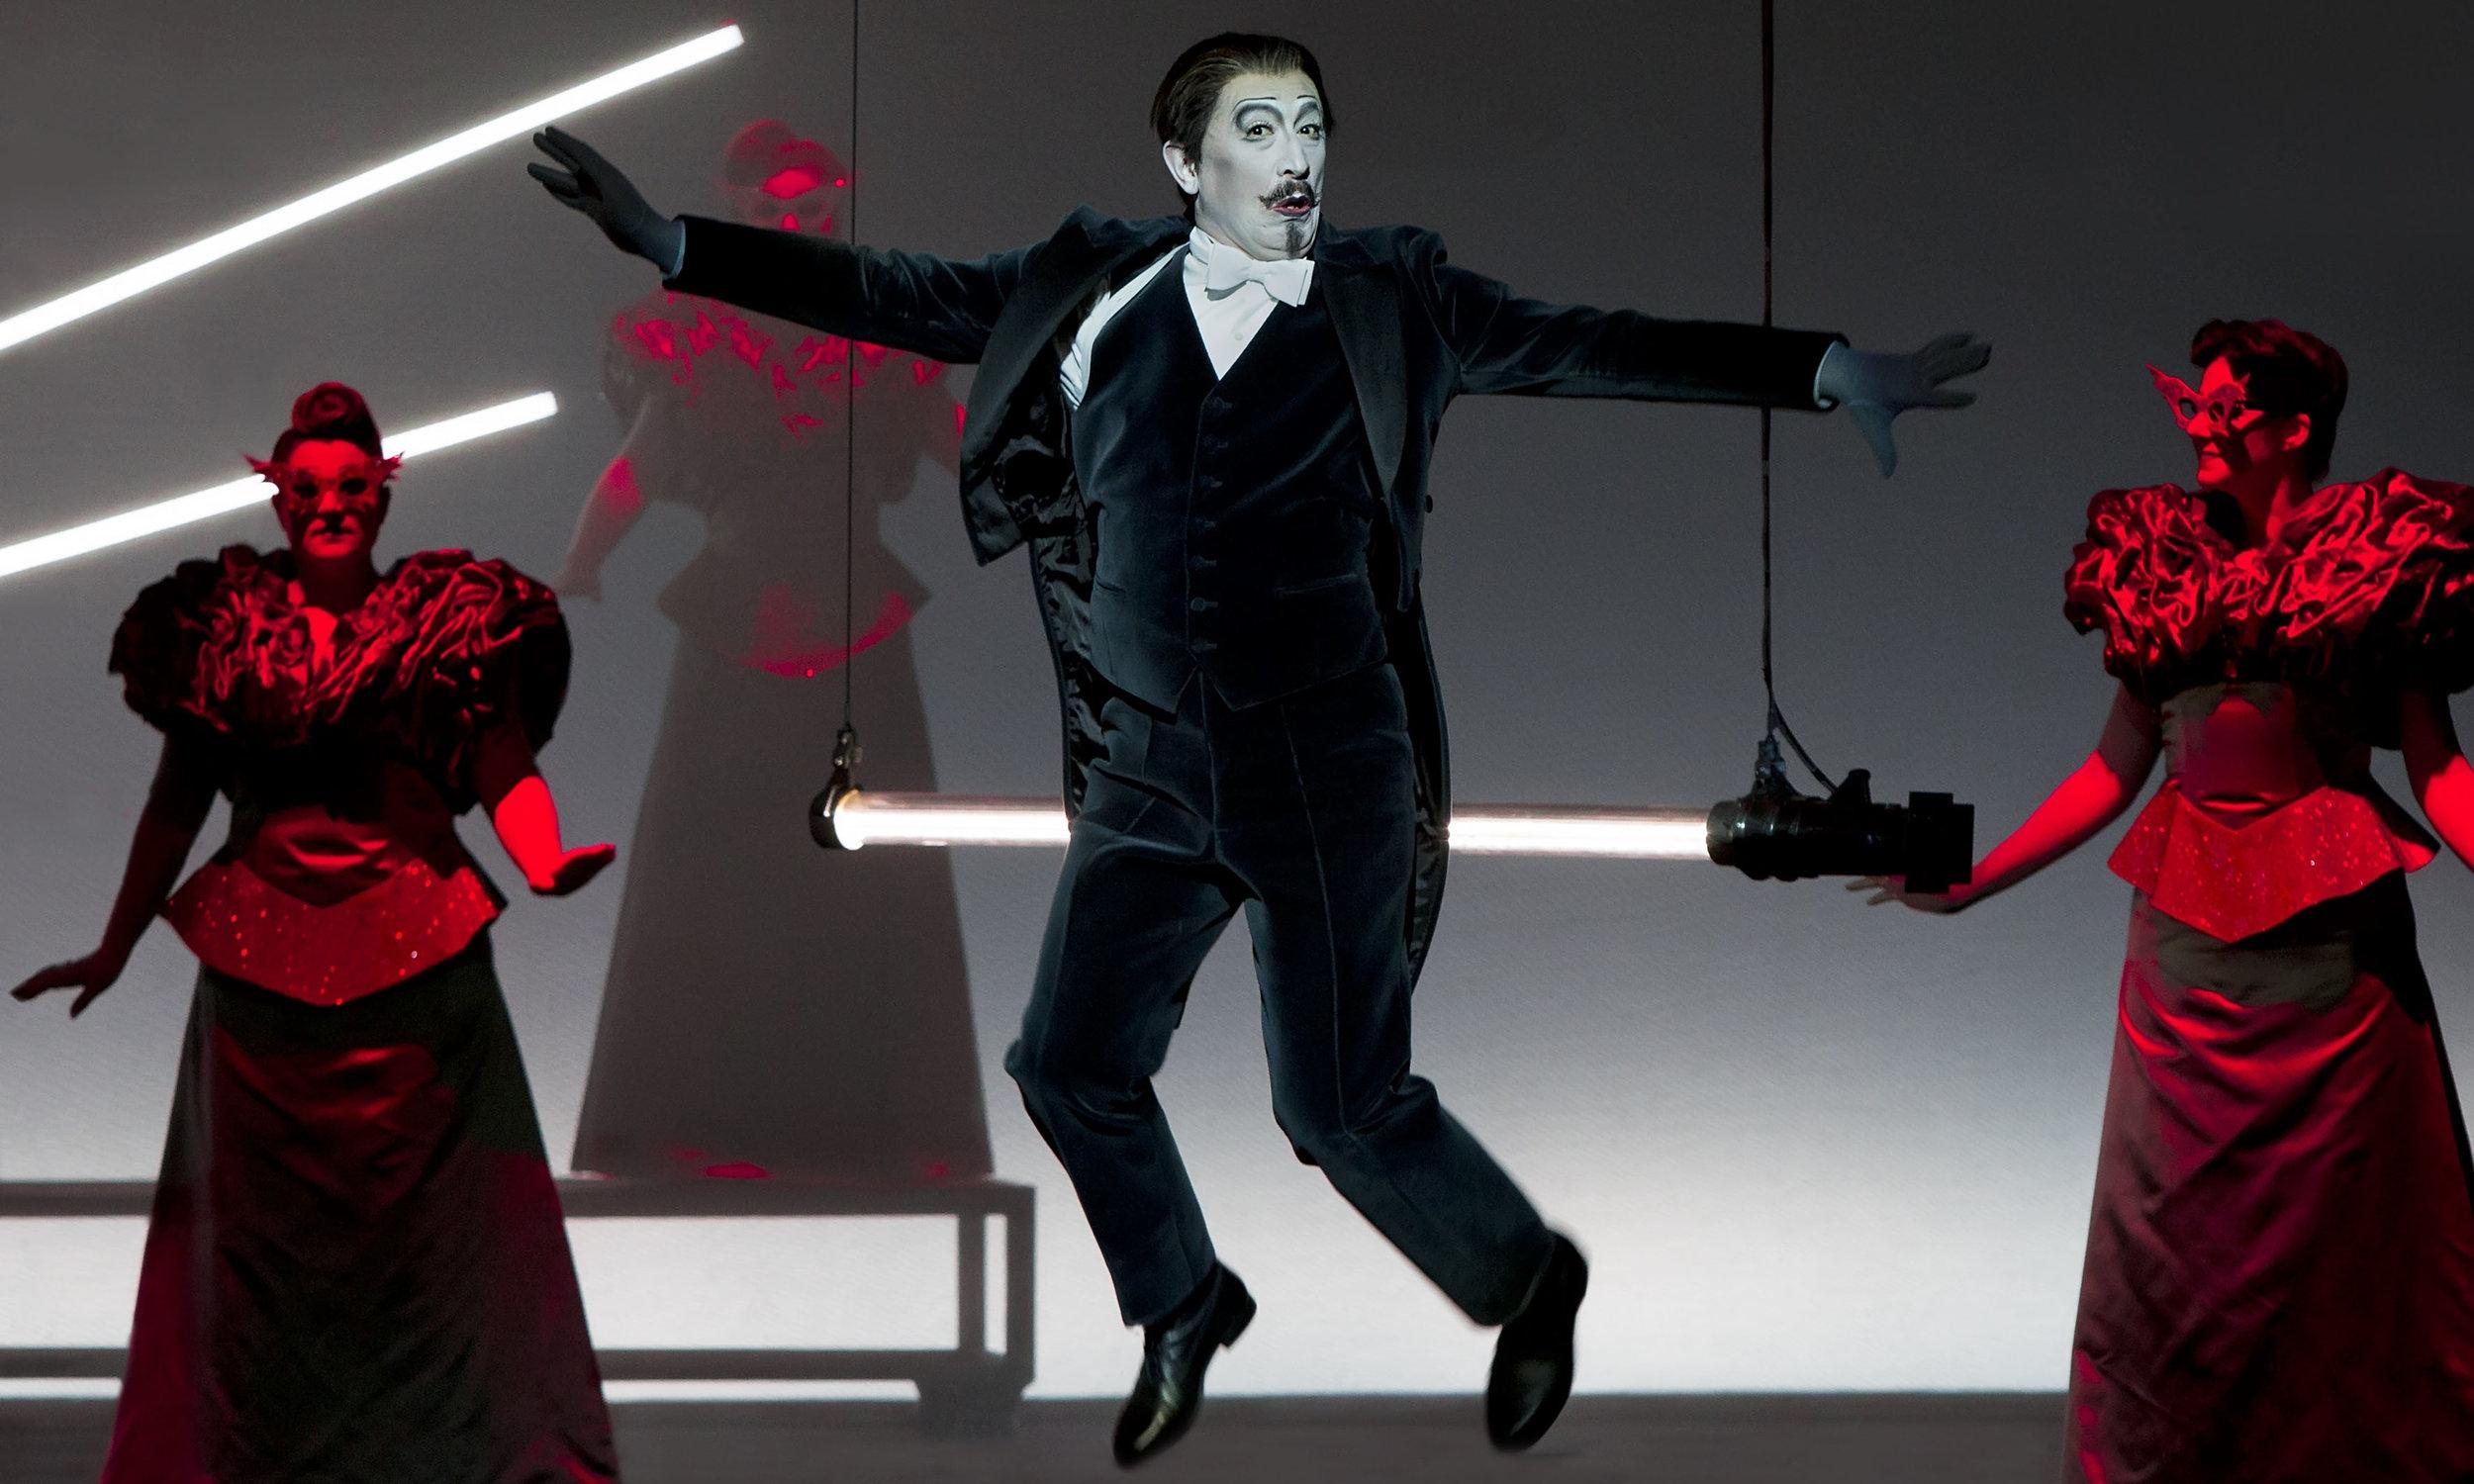 Act II, Scene 2: Vladimir Taisaev (Doctor), Chorus of the Perm Opera. Perm, 2016